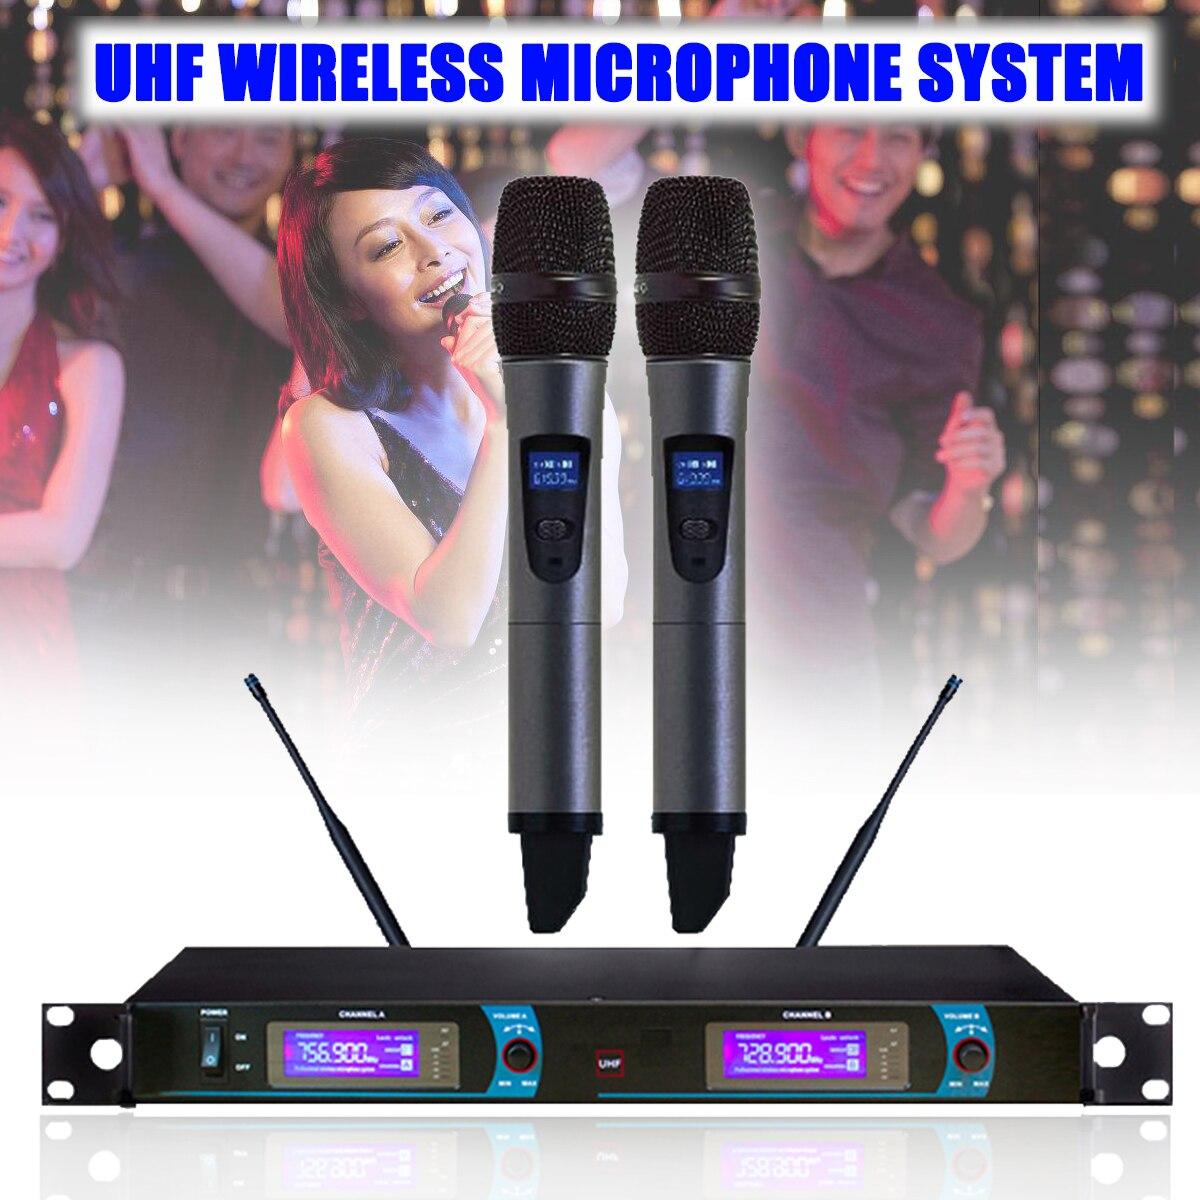 LCD Display UHF Wireless Dual Studio Microphone Mic System Home KTV Karaoke DJ Wireless Microphone Profesional for Computer стоимость